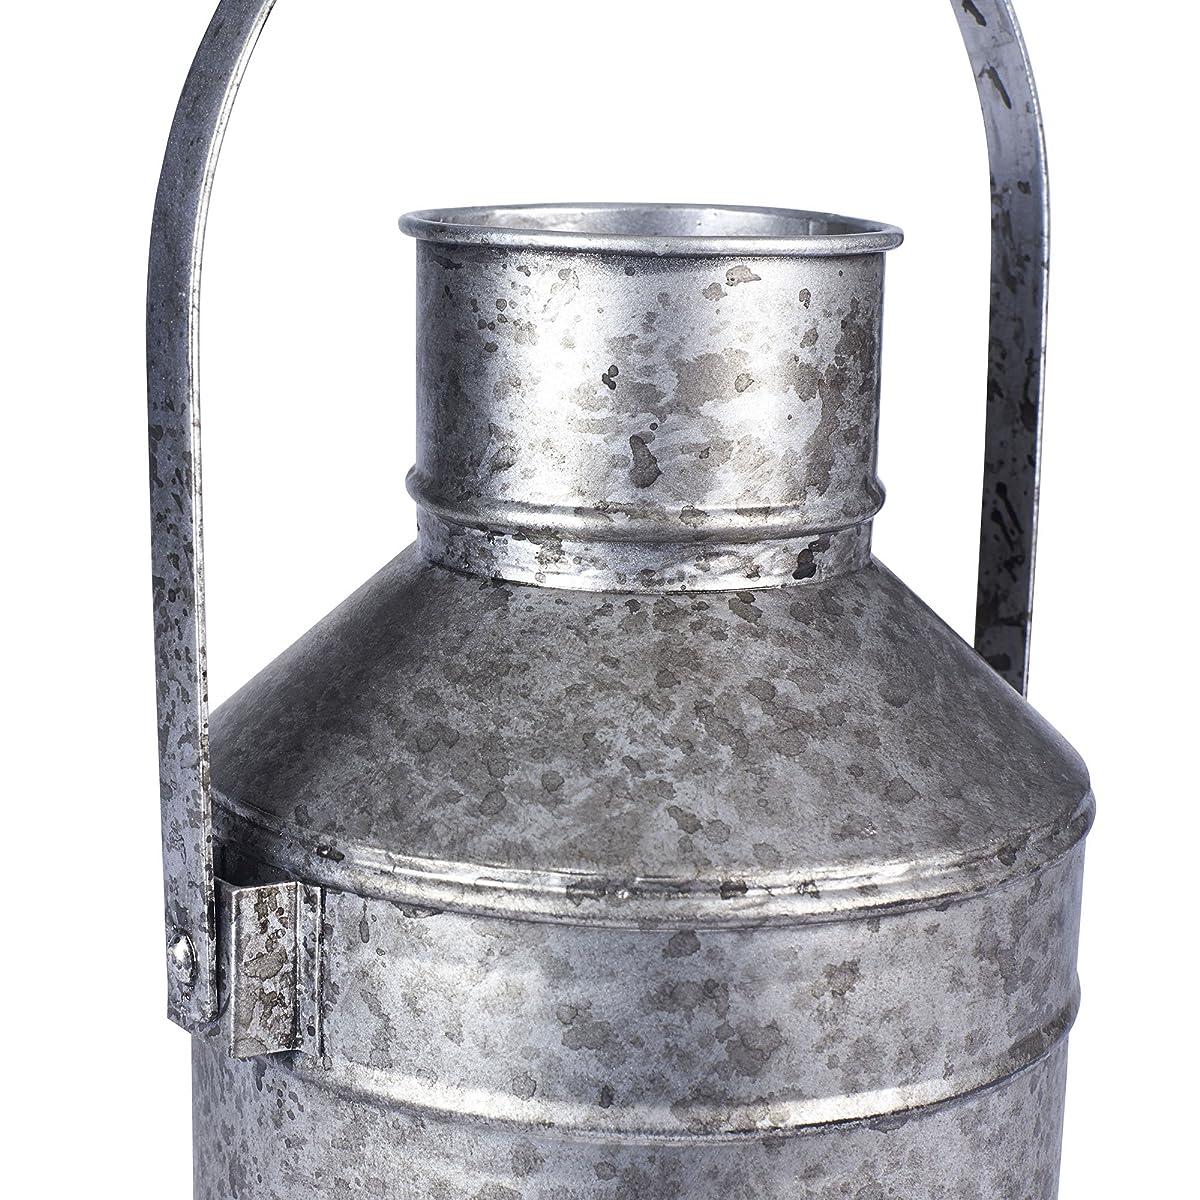 Vintage Style Milk Pail Vase